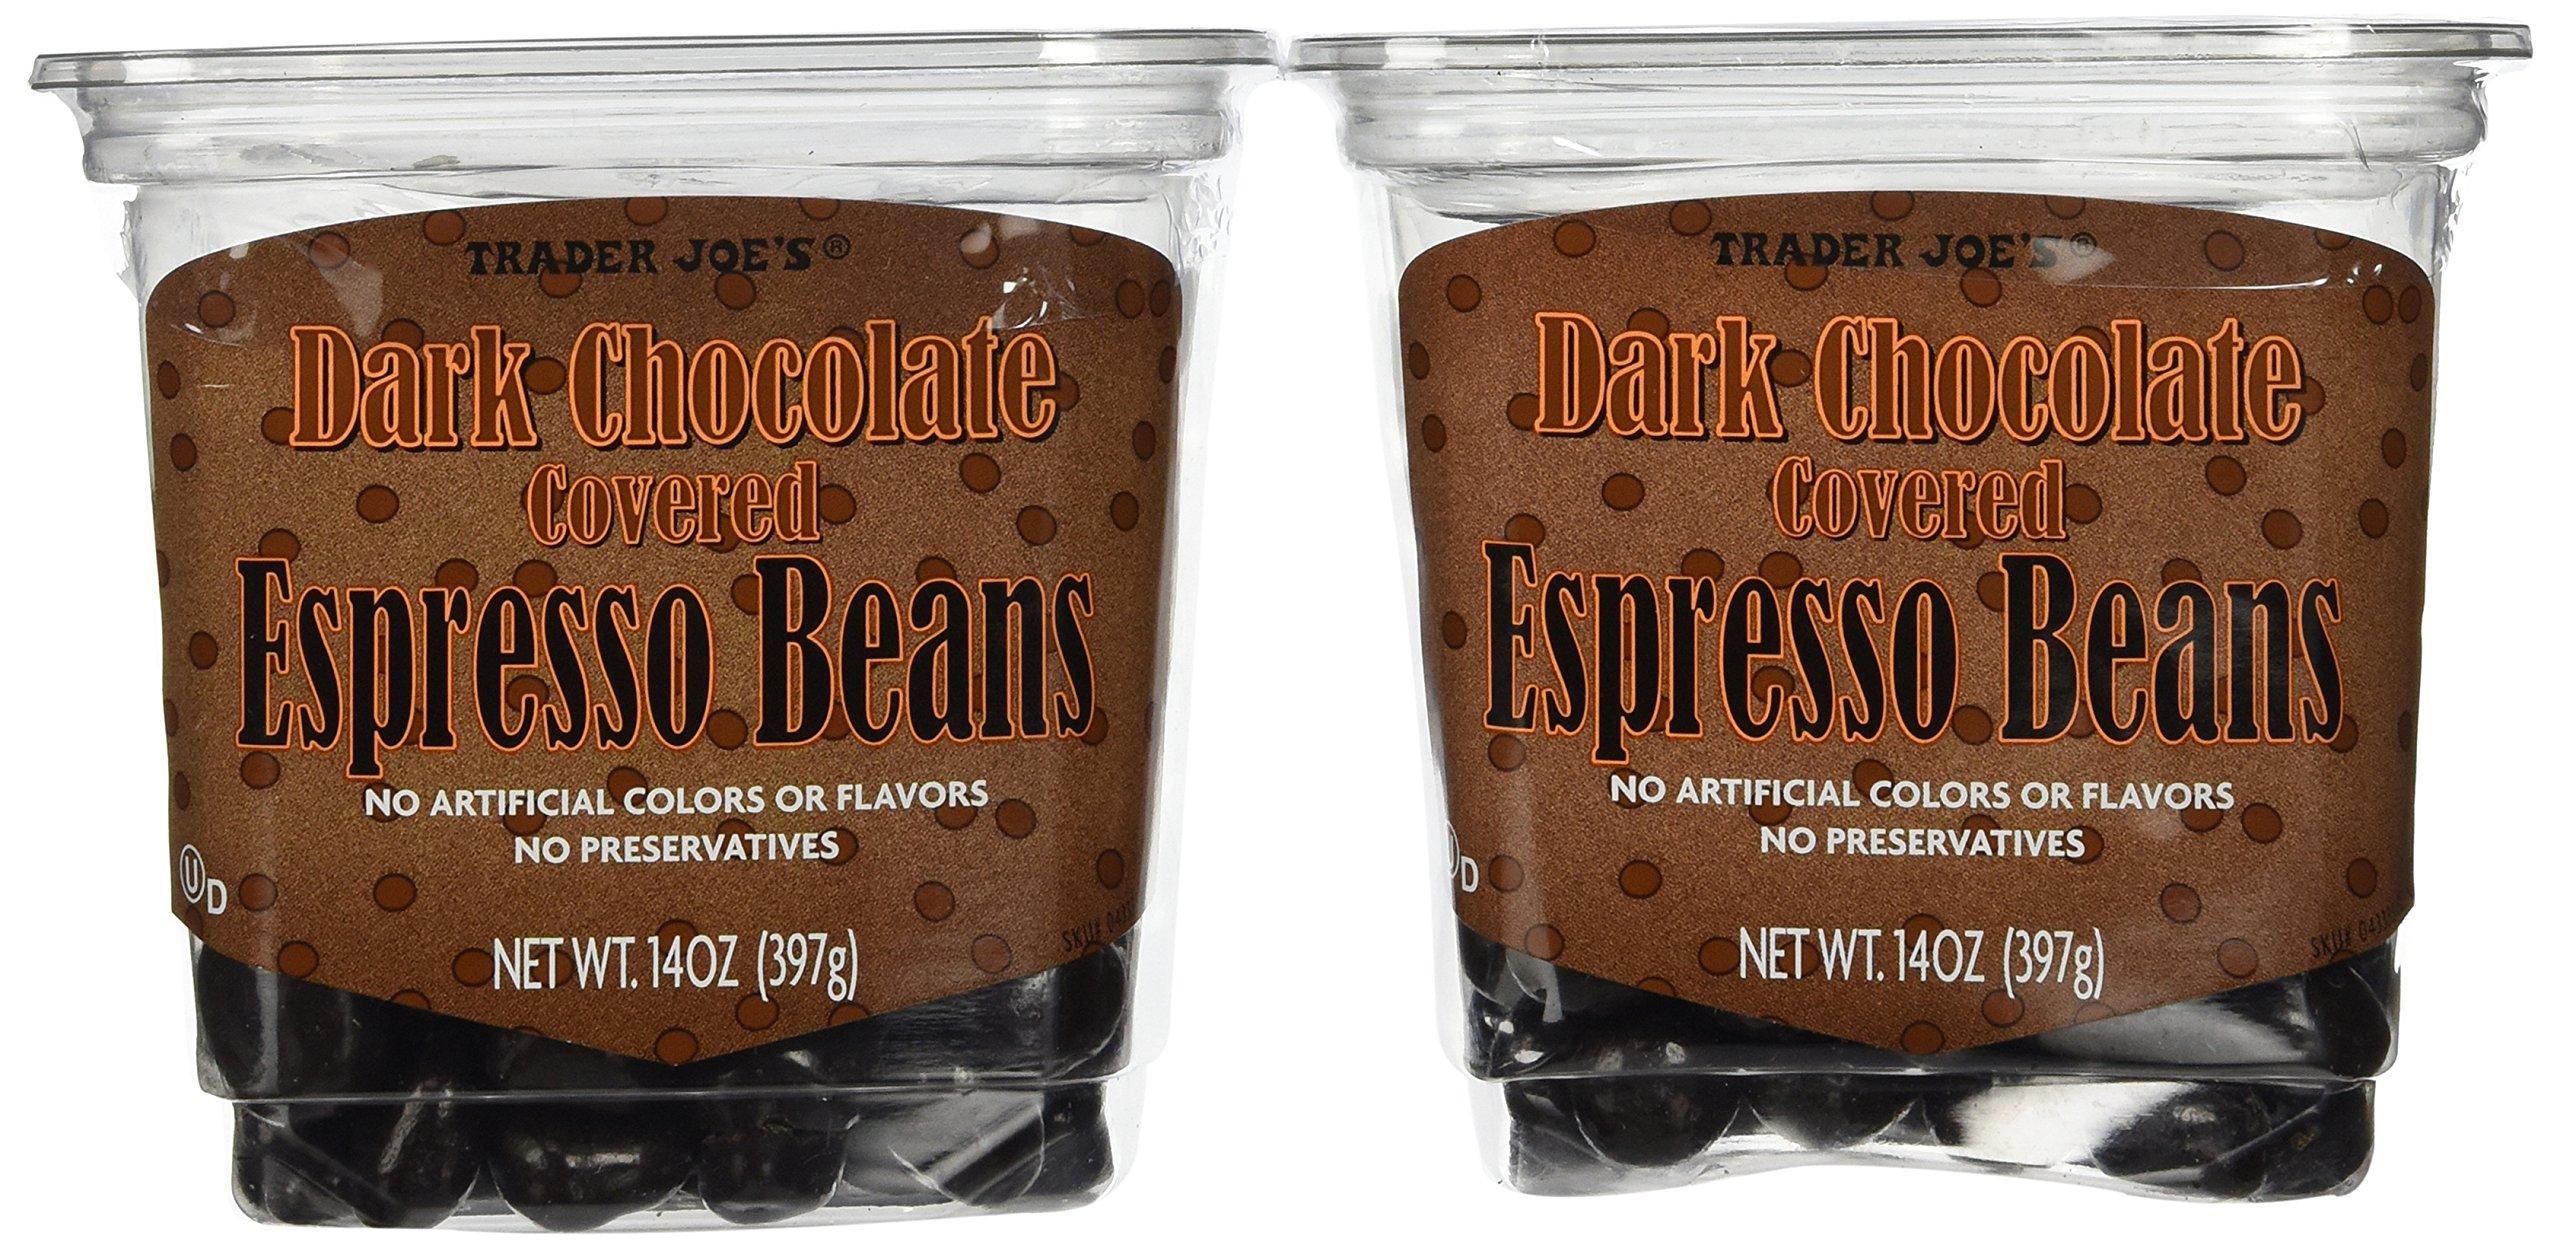 Trader Joe's Dark Chocolate Covered Espresso Beans, 14oz. (2 pack) by Trader Joe's